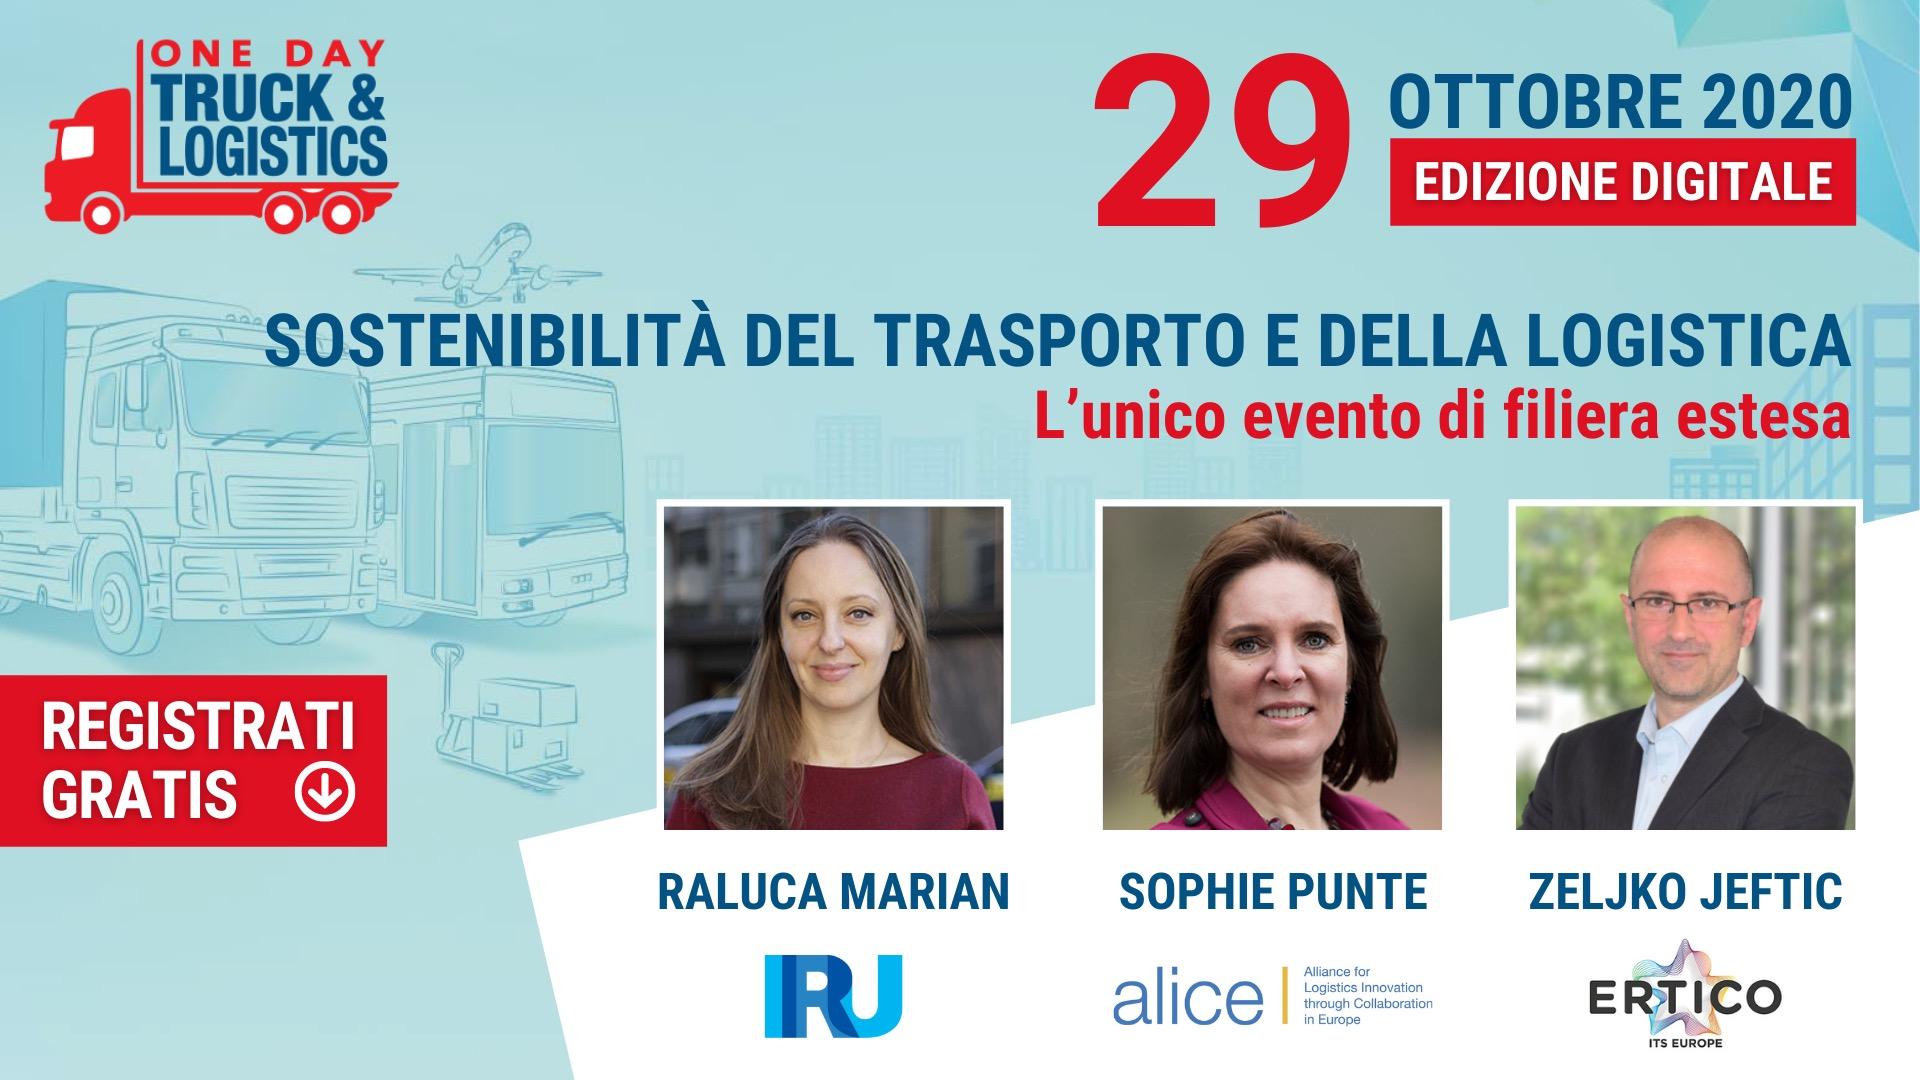 one day truck and logistics IRU Alice Ertico 29 ottobre2020 digital edition fiap autotrasporti v2